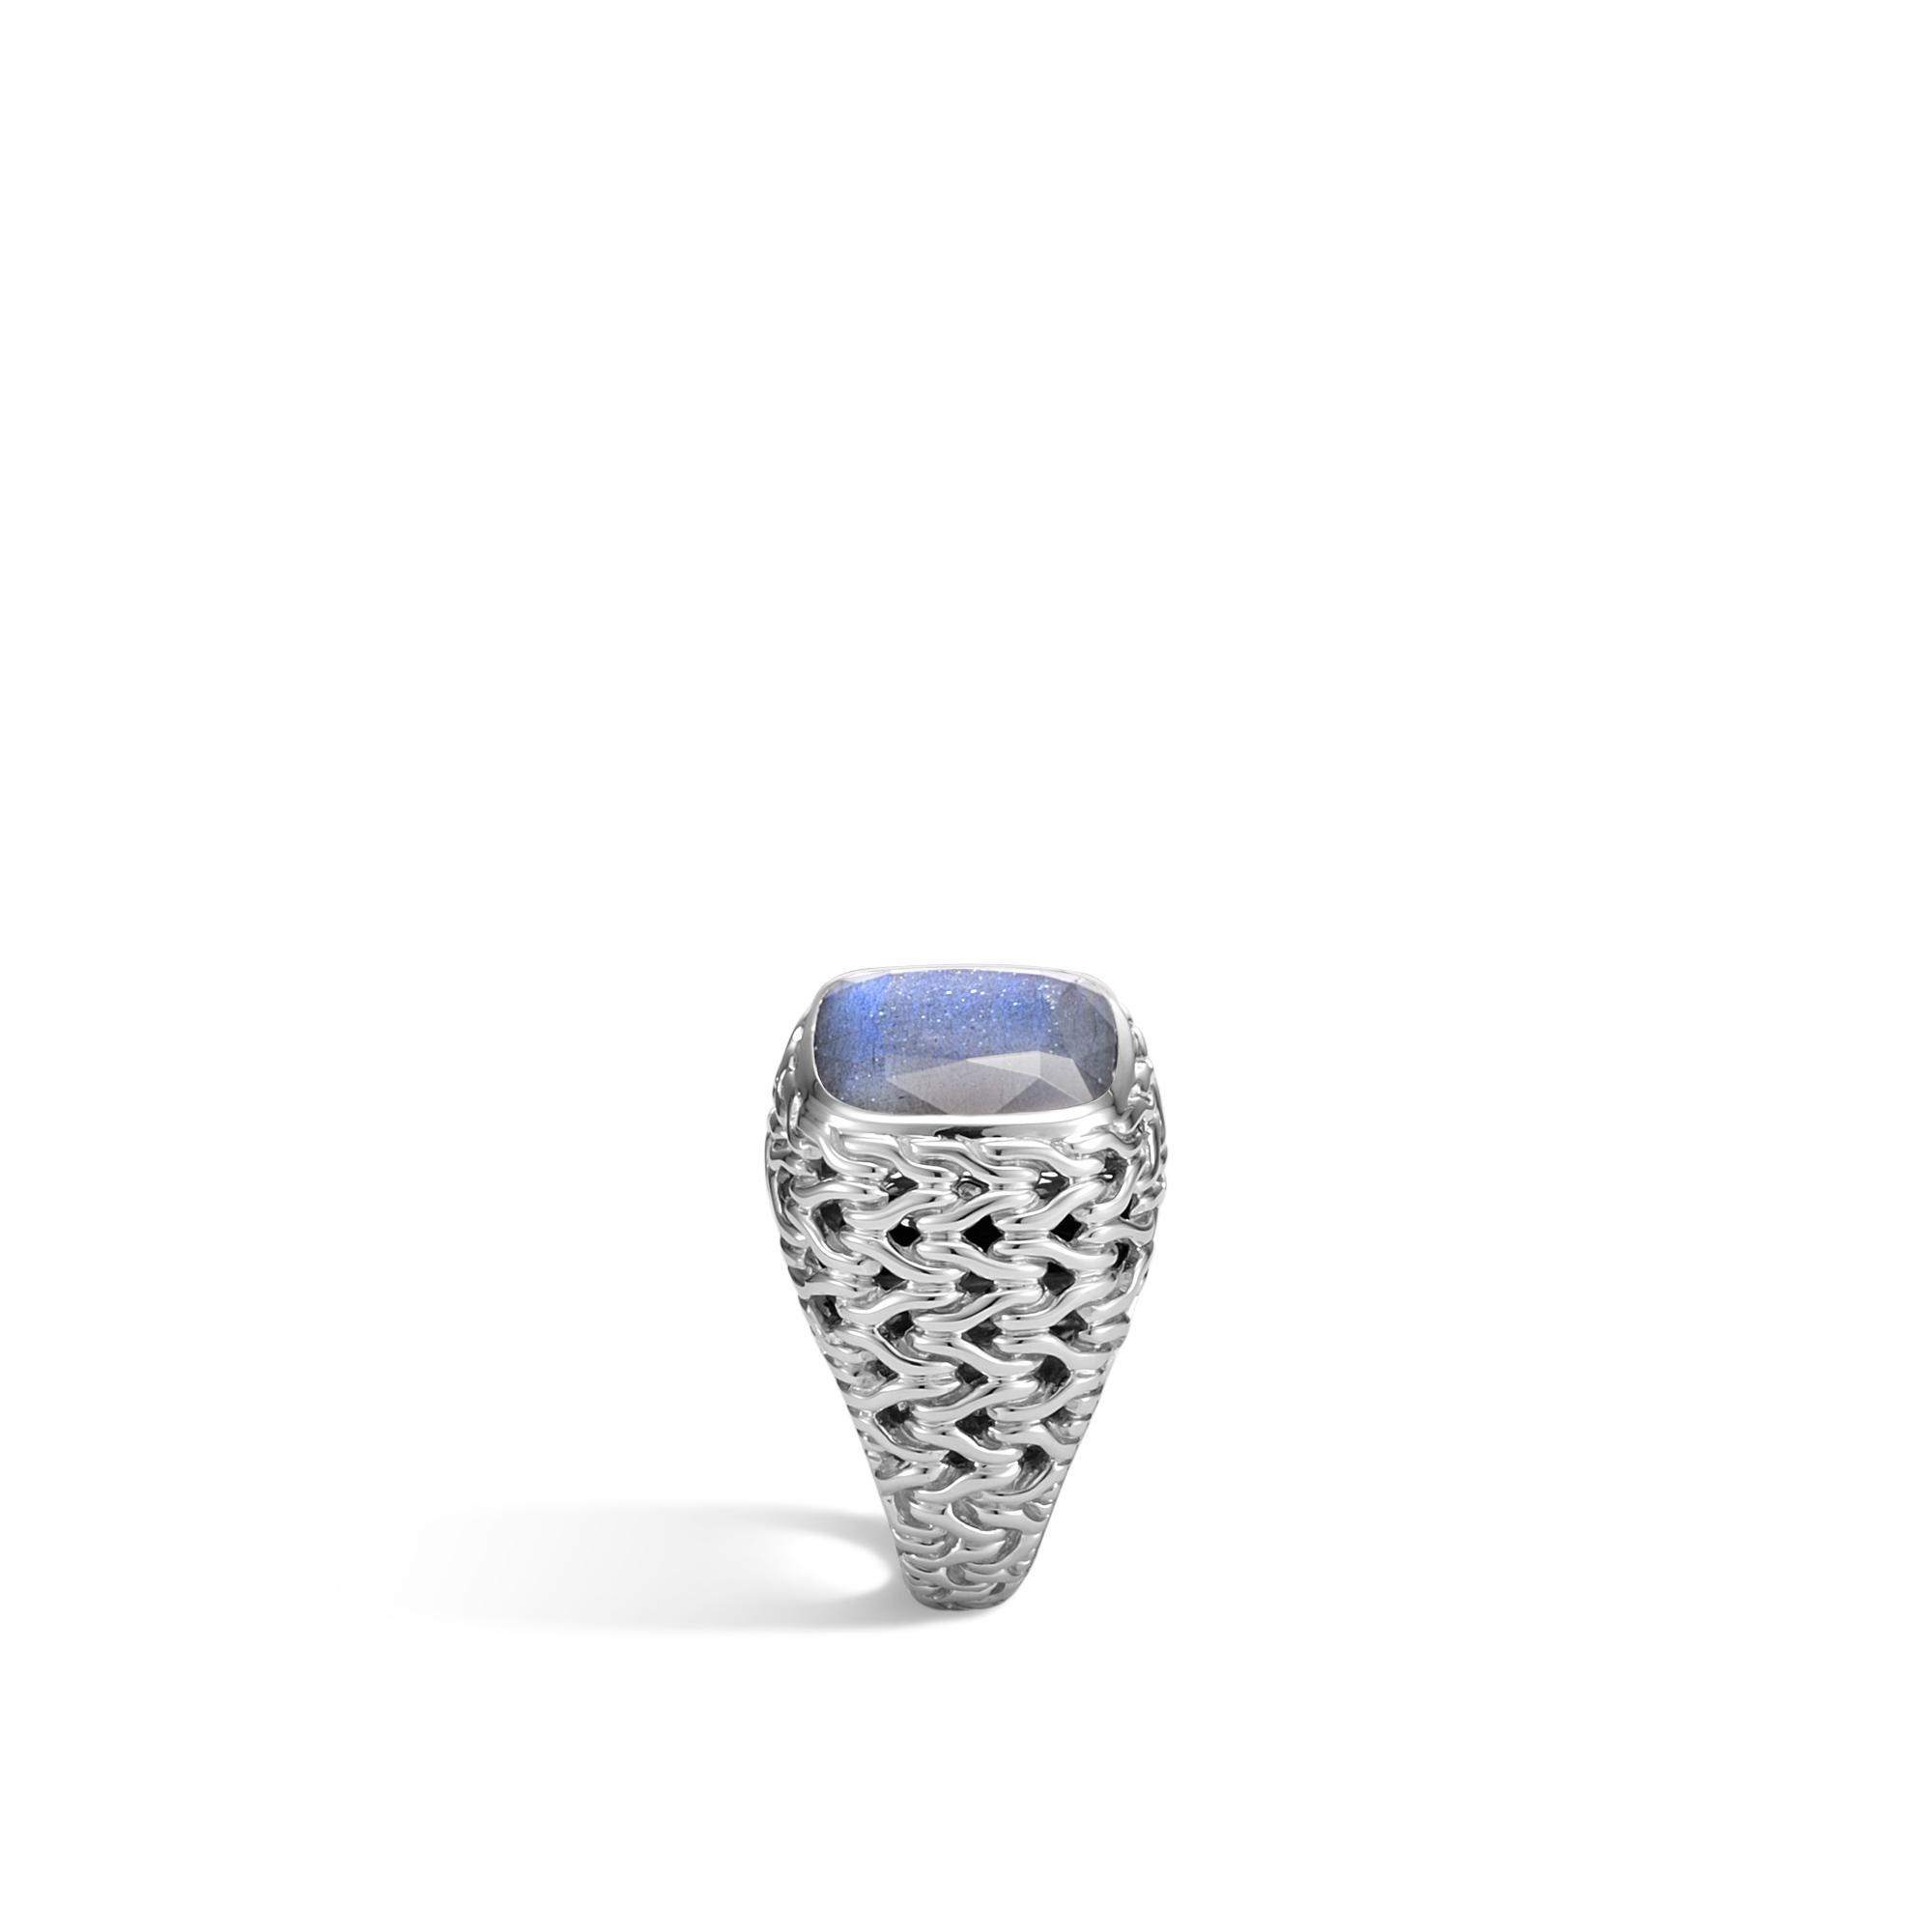 John Hardy Magic Cut Ring In Silver With Labradorite qxwu9trM